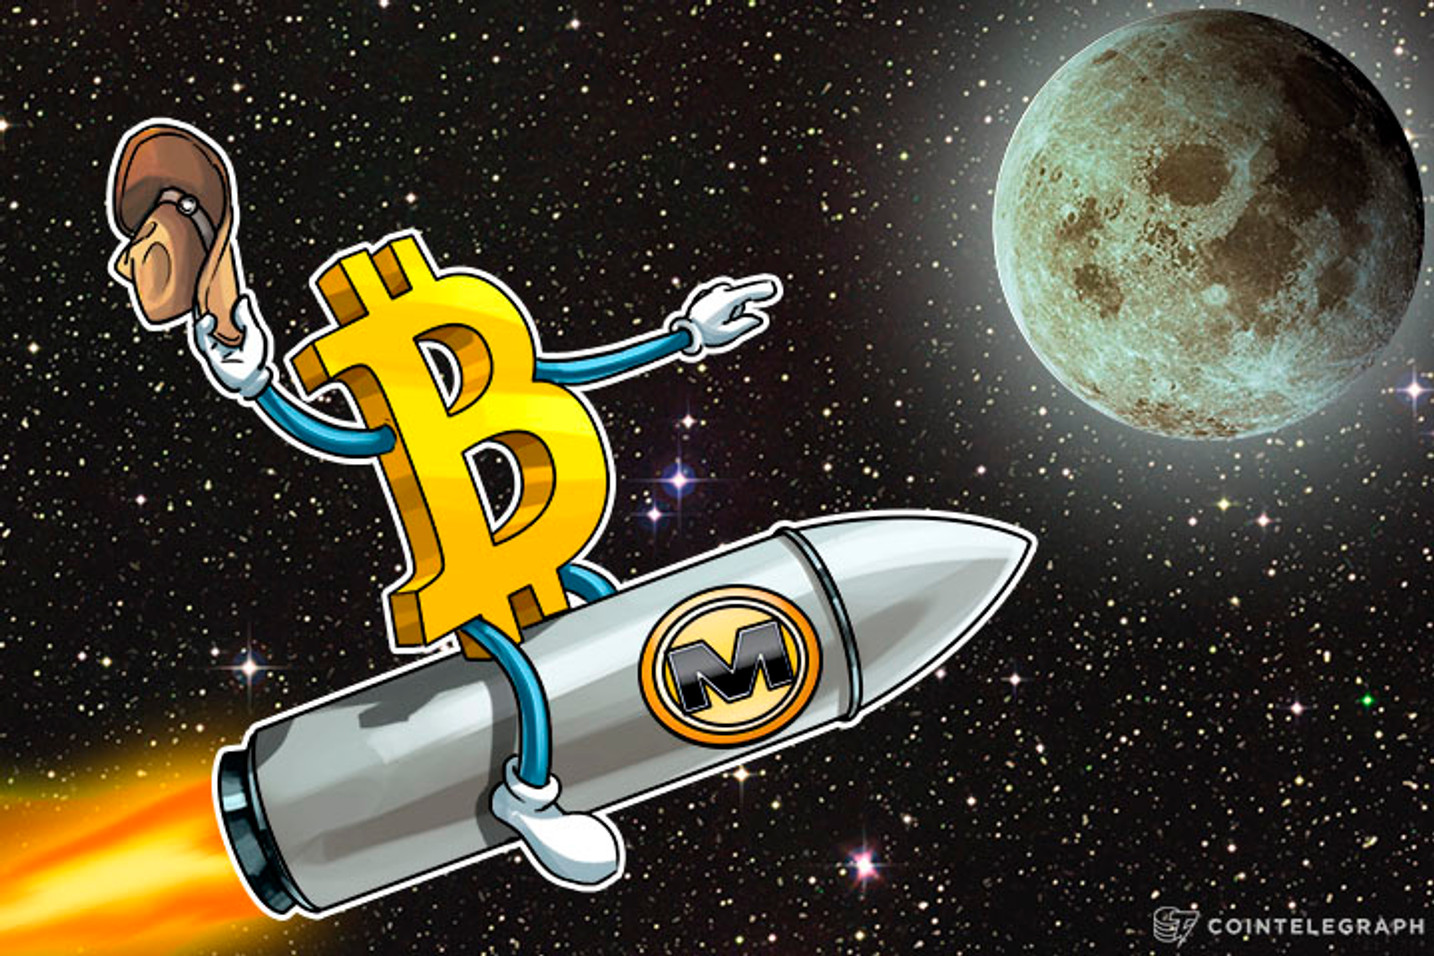 Kim Dotcom Explains How Megaupload 2.0 Will Take Bitcoin To The Moon